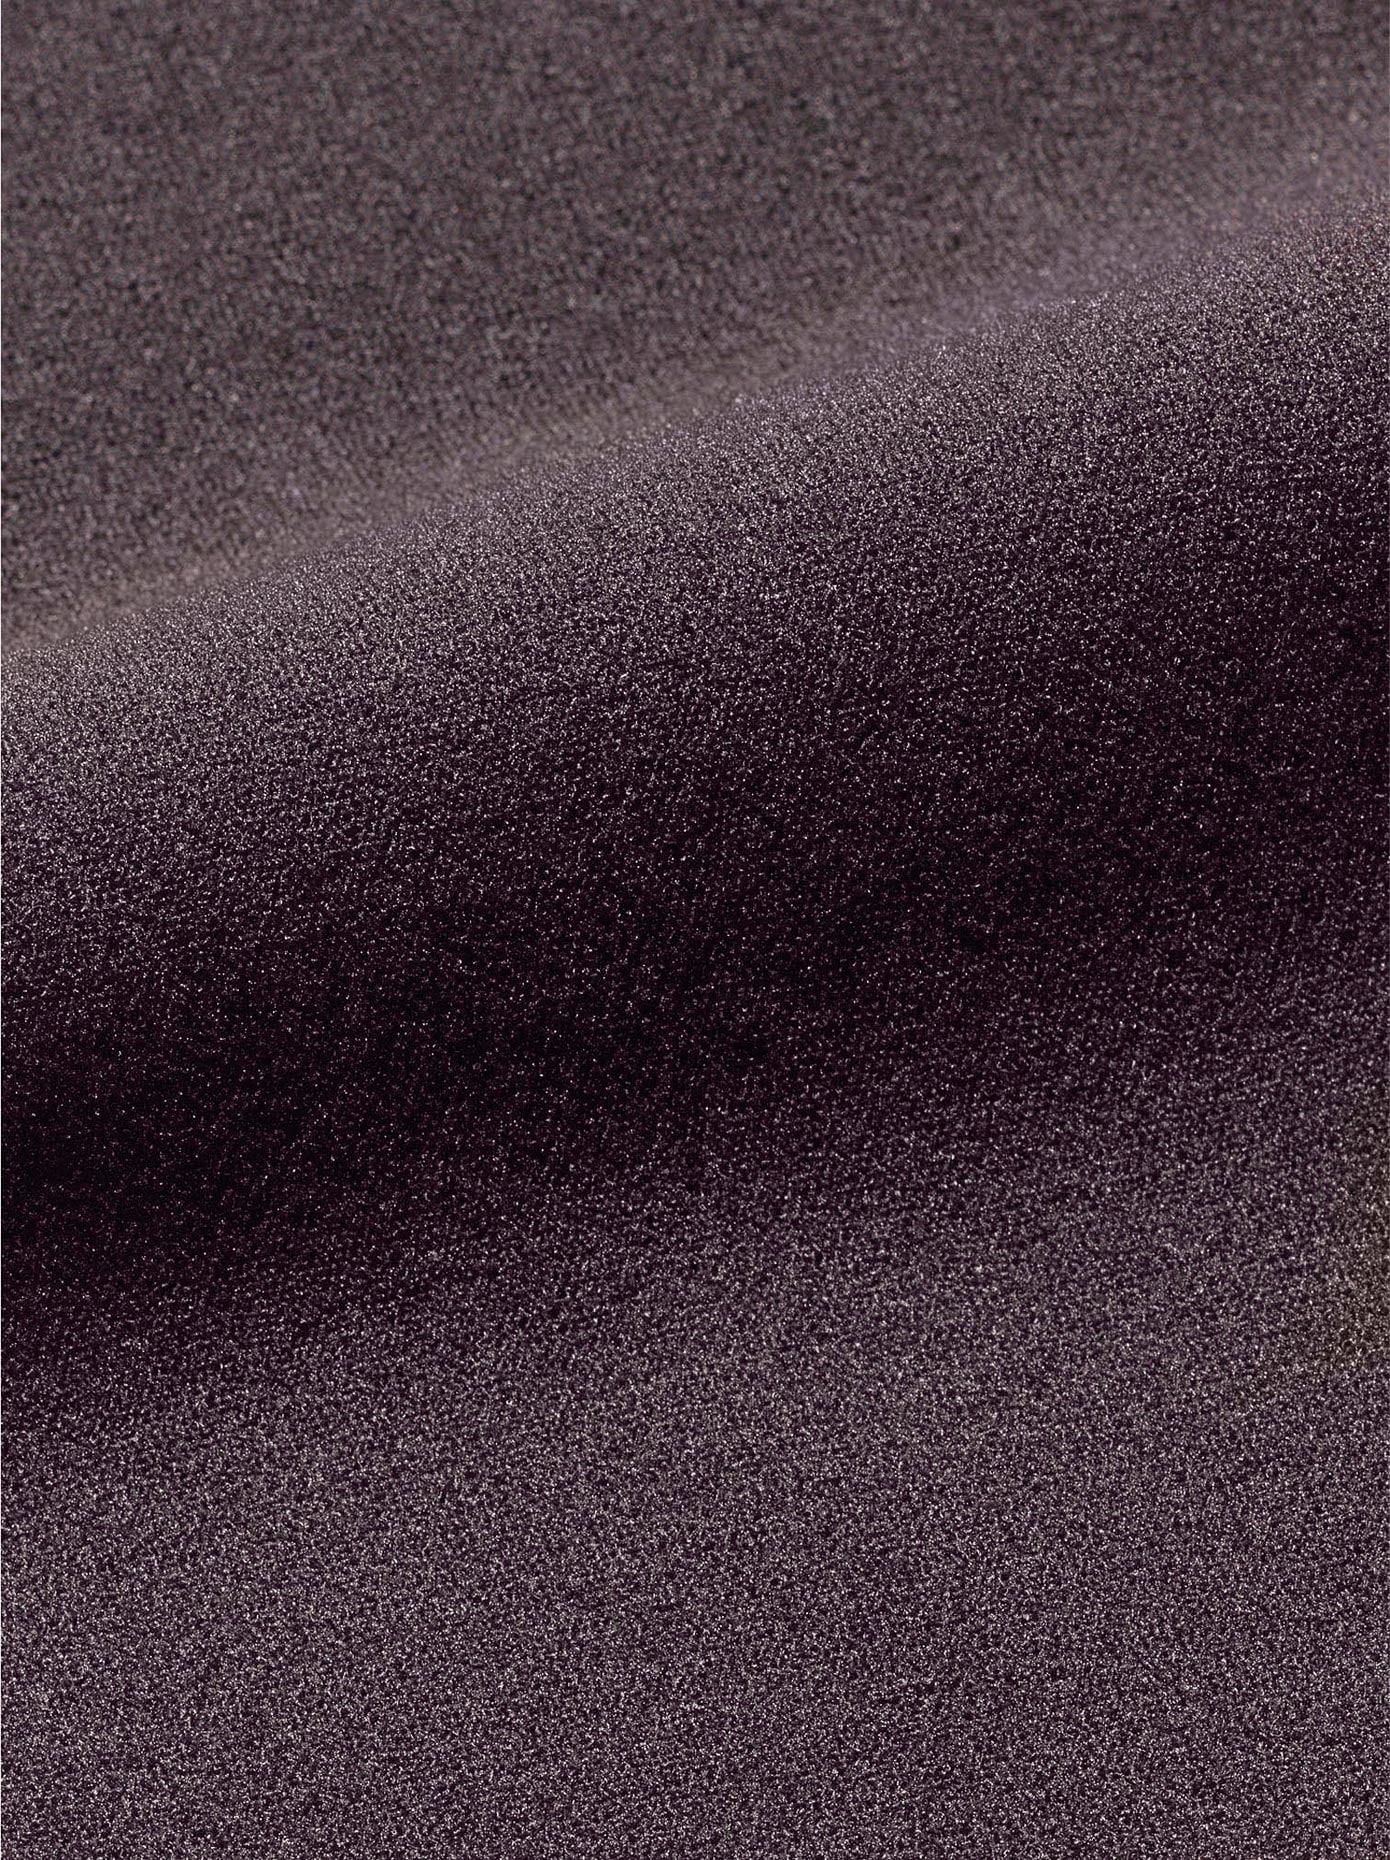 Esda Feinstrumpfhose grau Damen Feinstrumpfhosen Strumpfhosen Damenwäsche